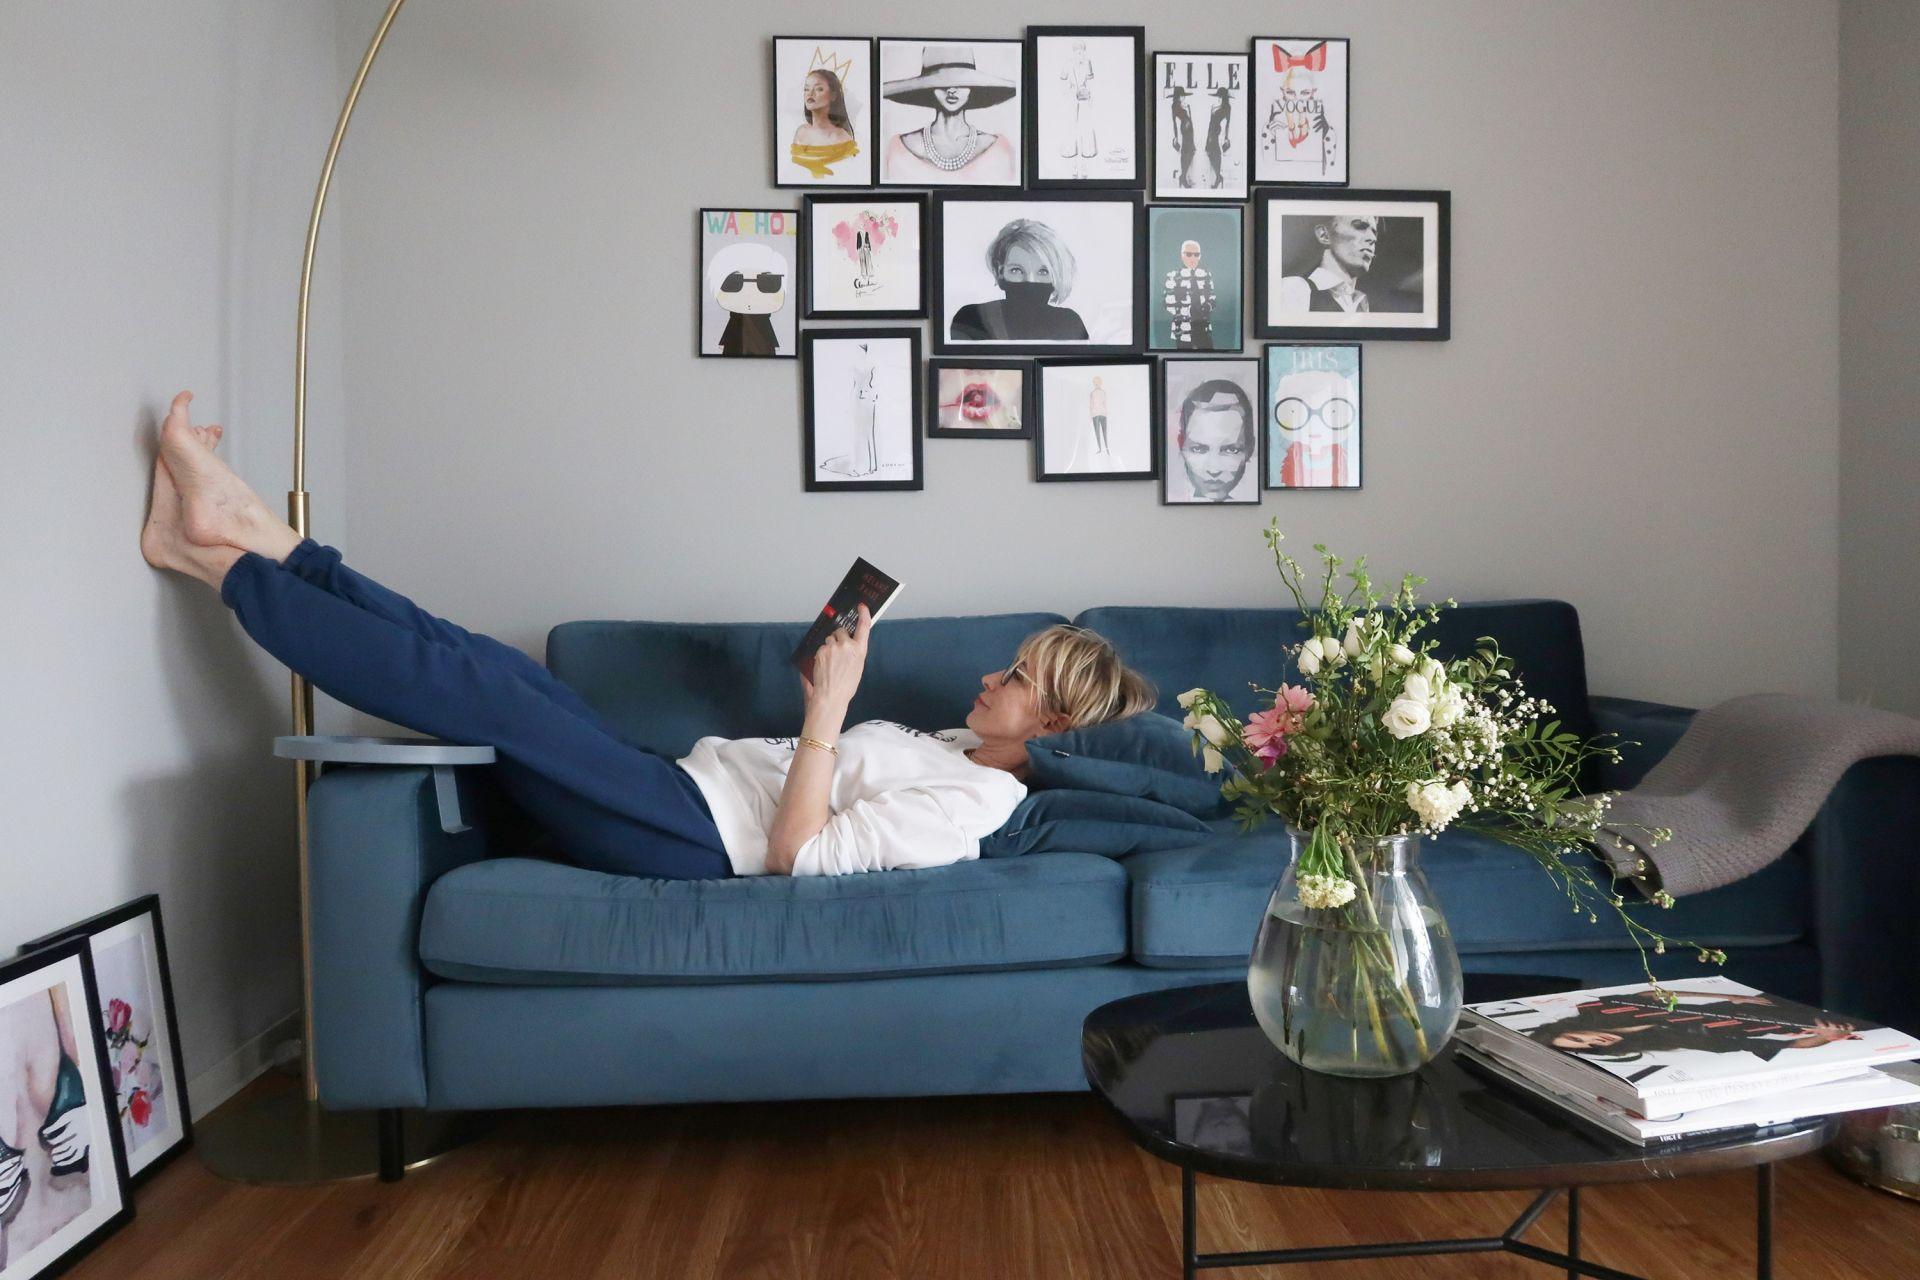 glamupyourlifestyle loungewear jogginghose homeoffice ue-40-blog ue-50-blog